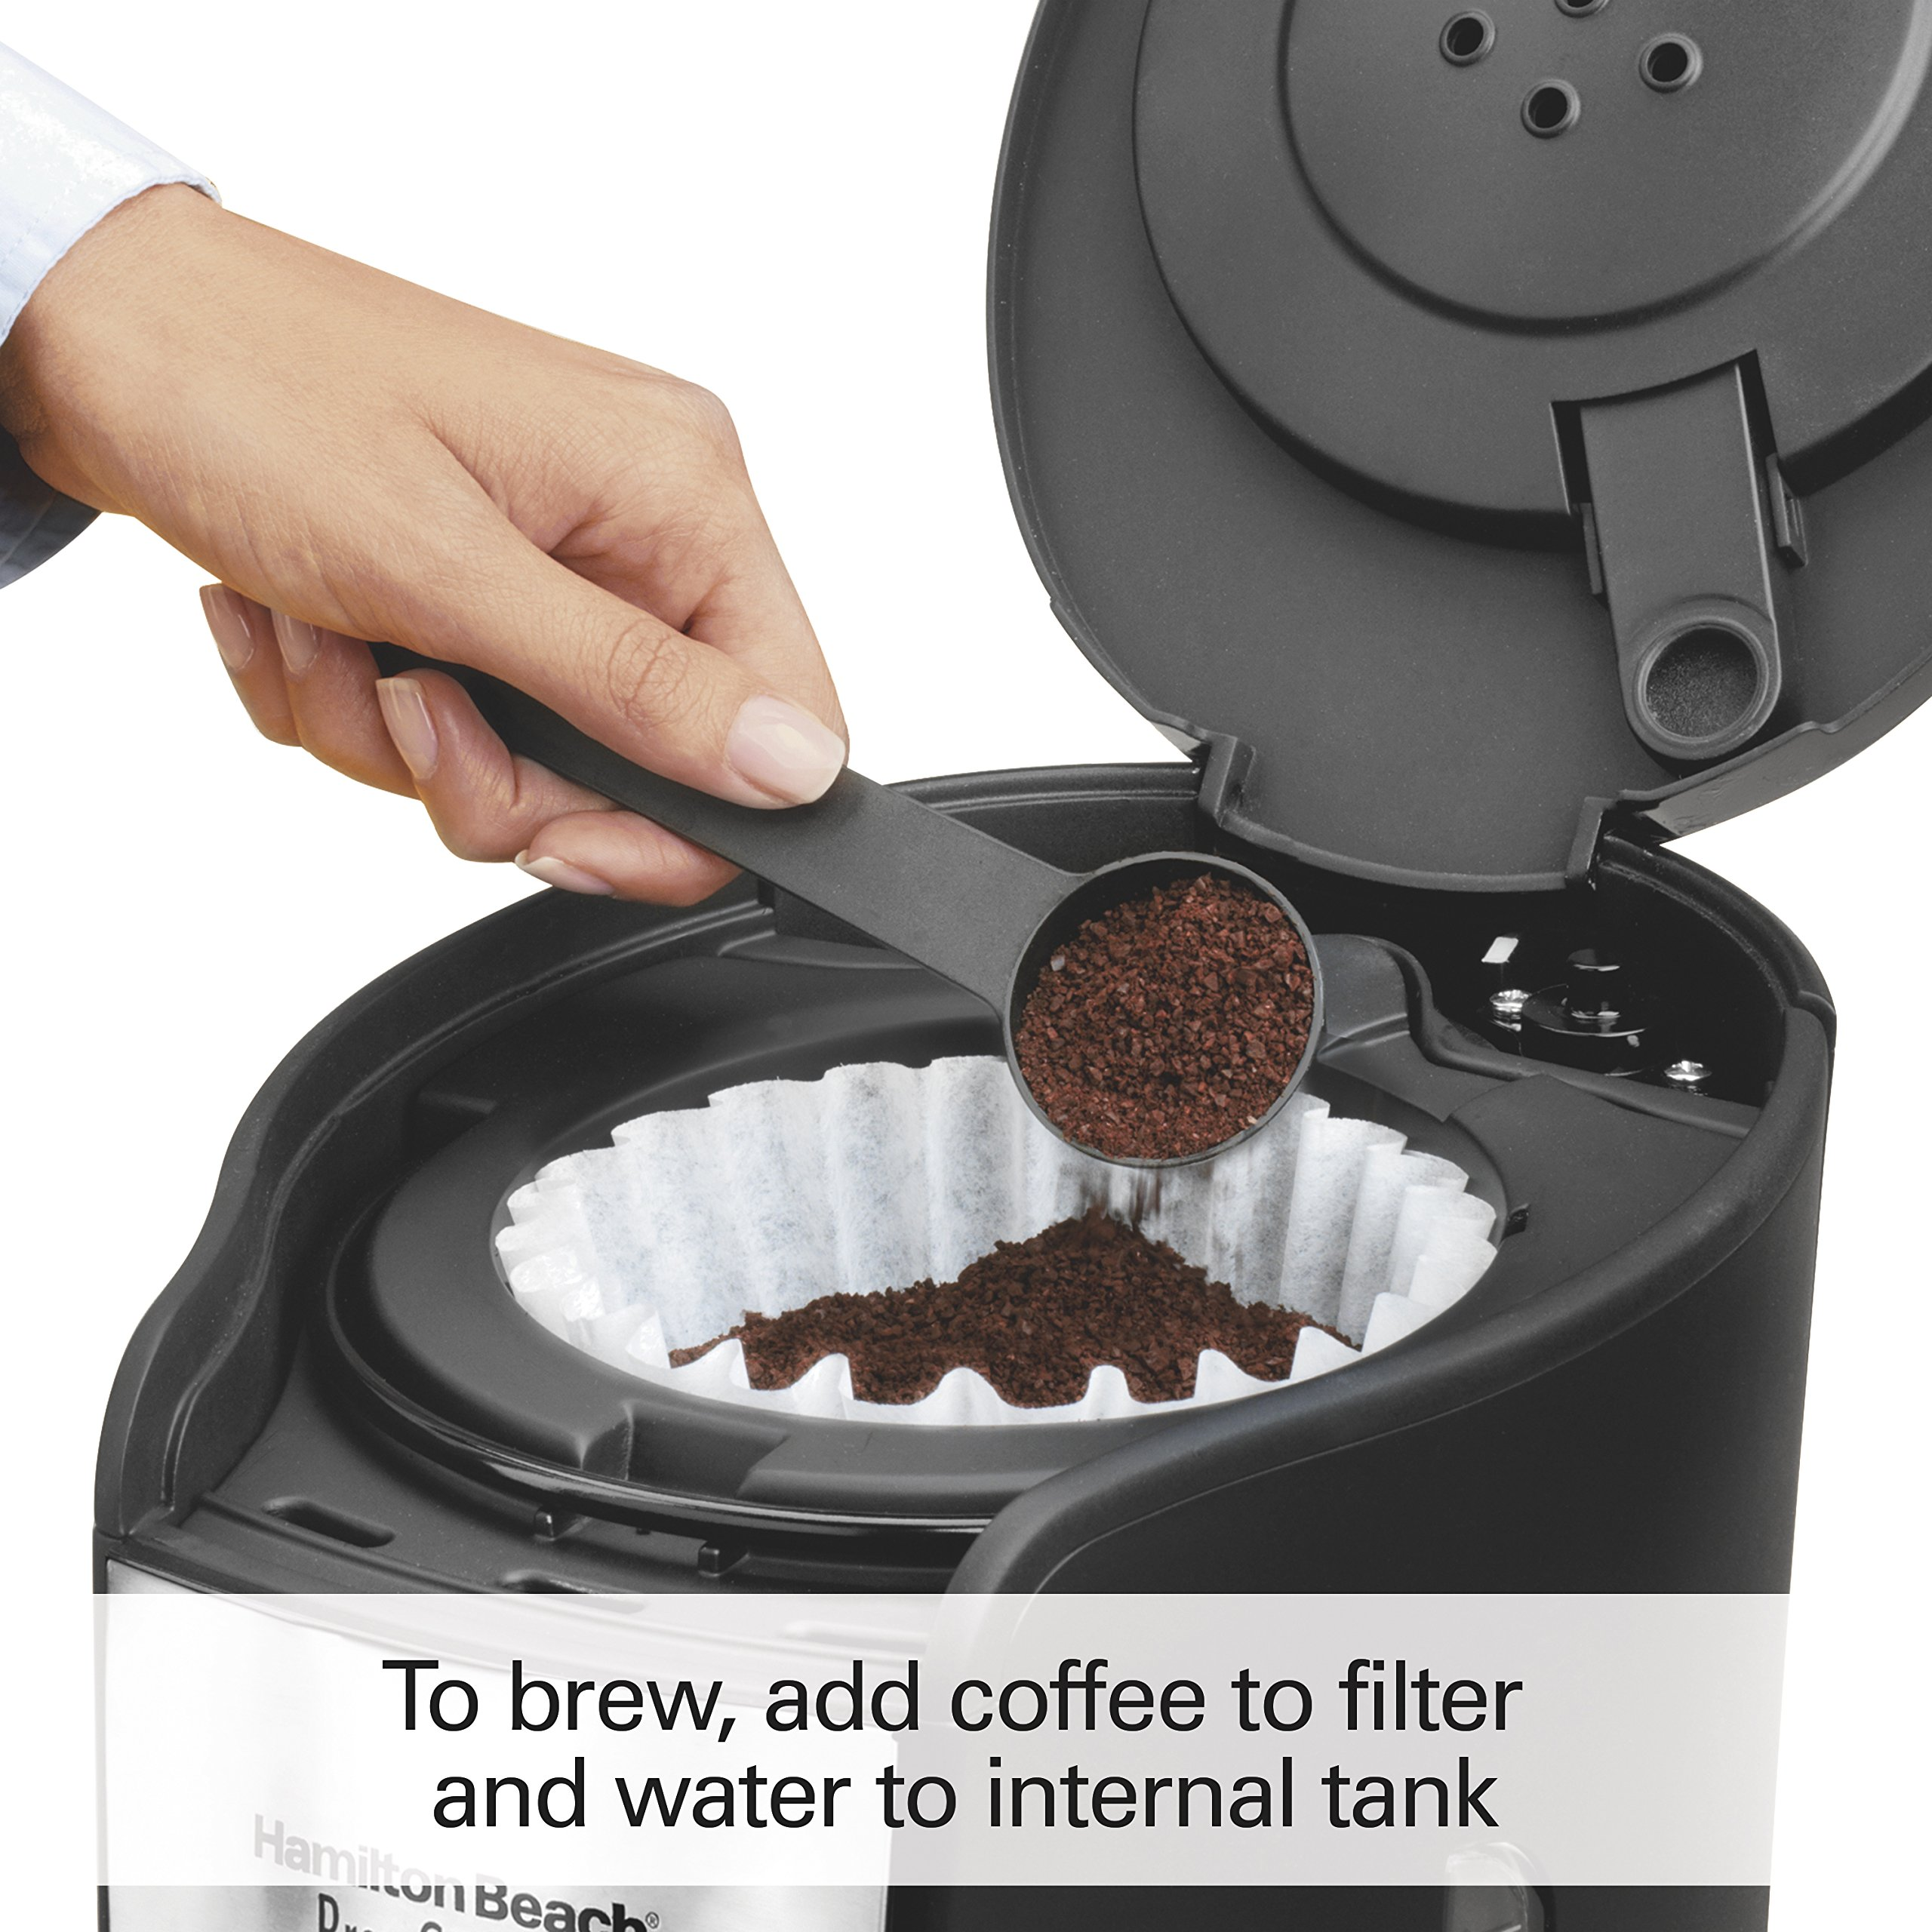 Hamilton Beach (48464) Coffee Maker with 12 Cup Capacity & Internal Storage Coffee Pot, Brewstation, Black by Hamilton Beach (Image #5)